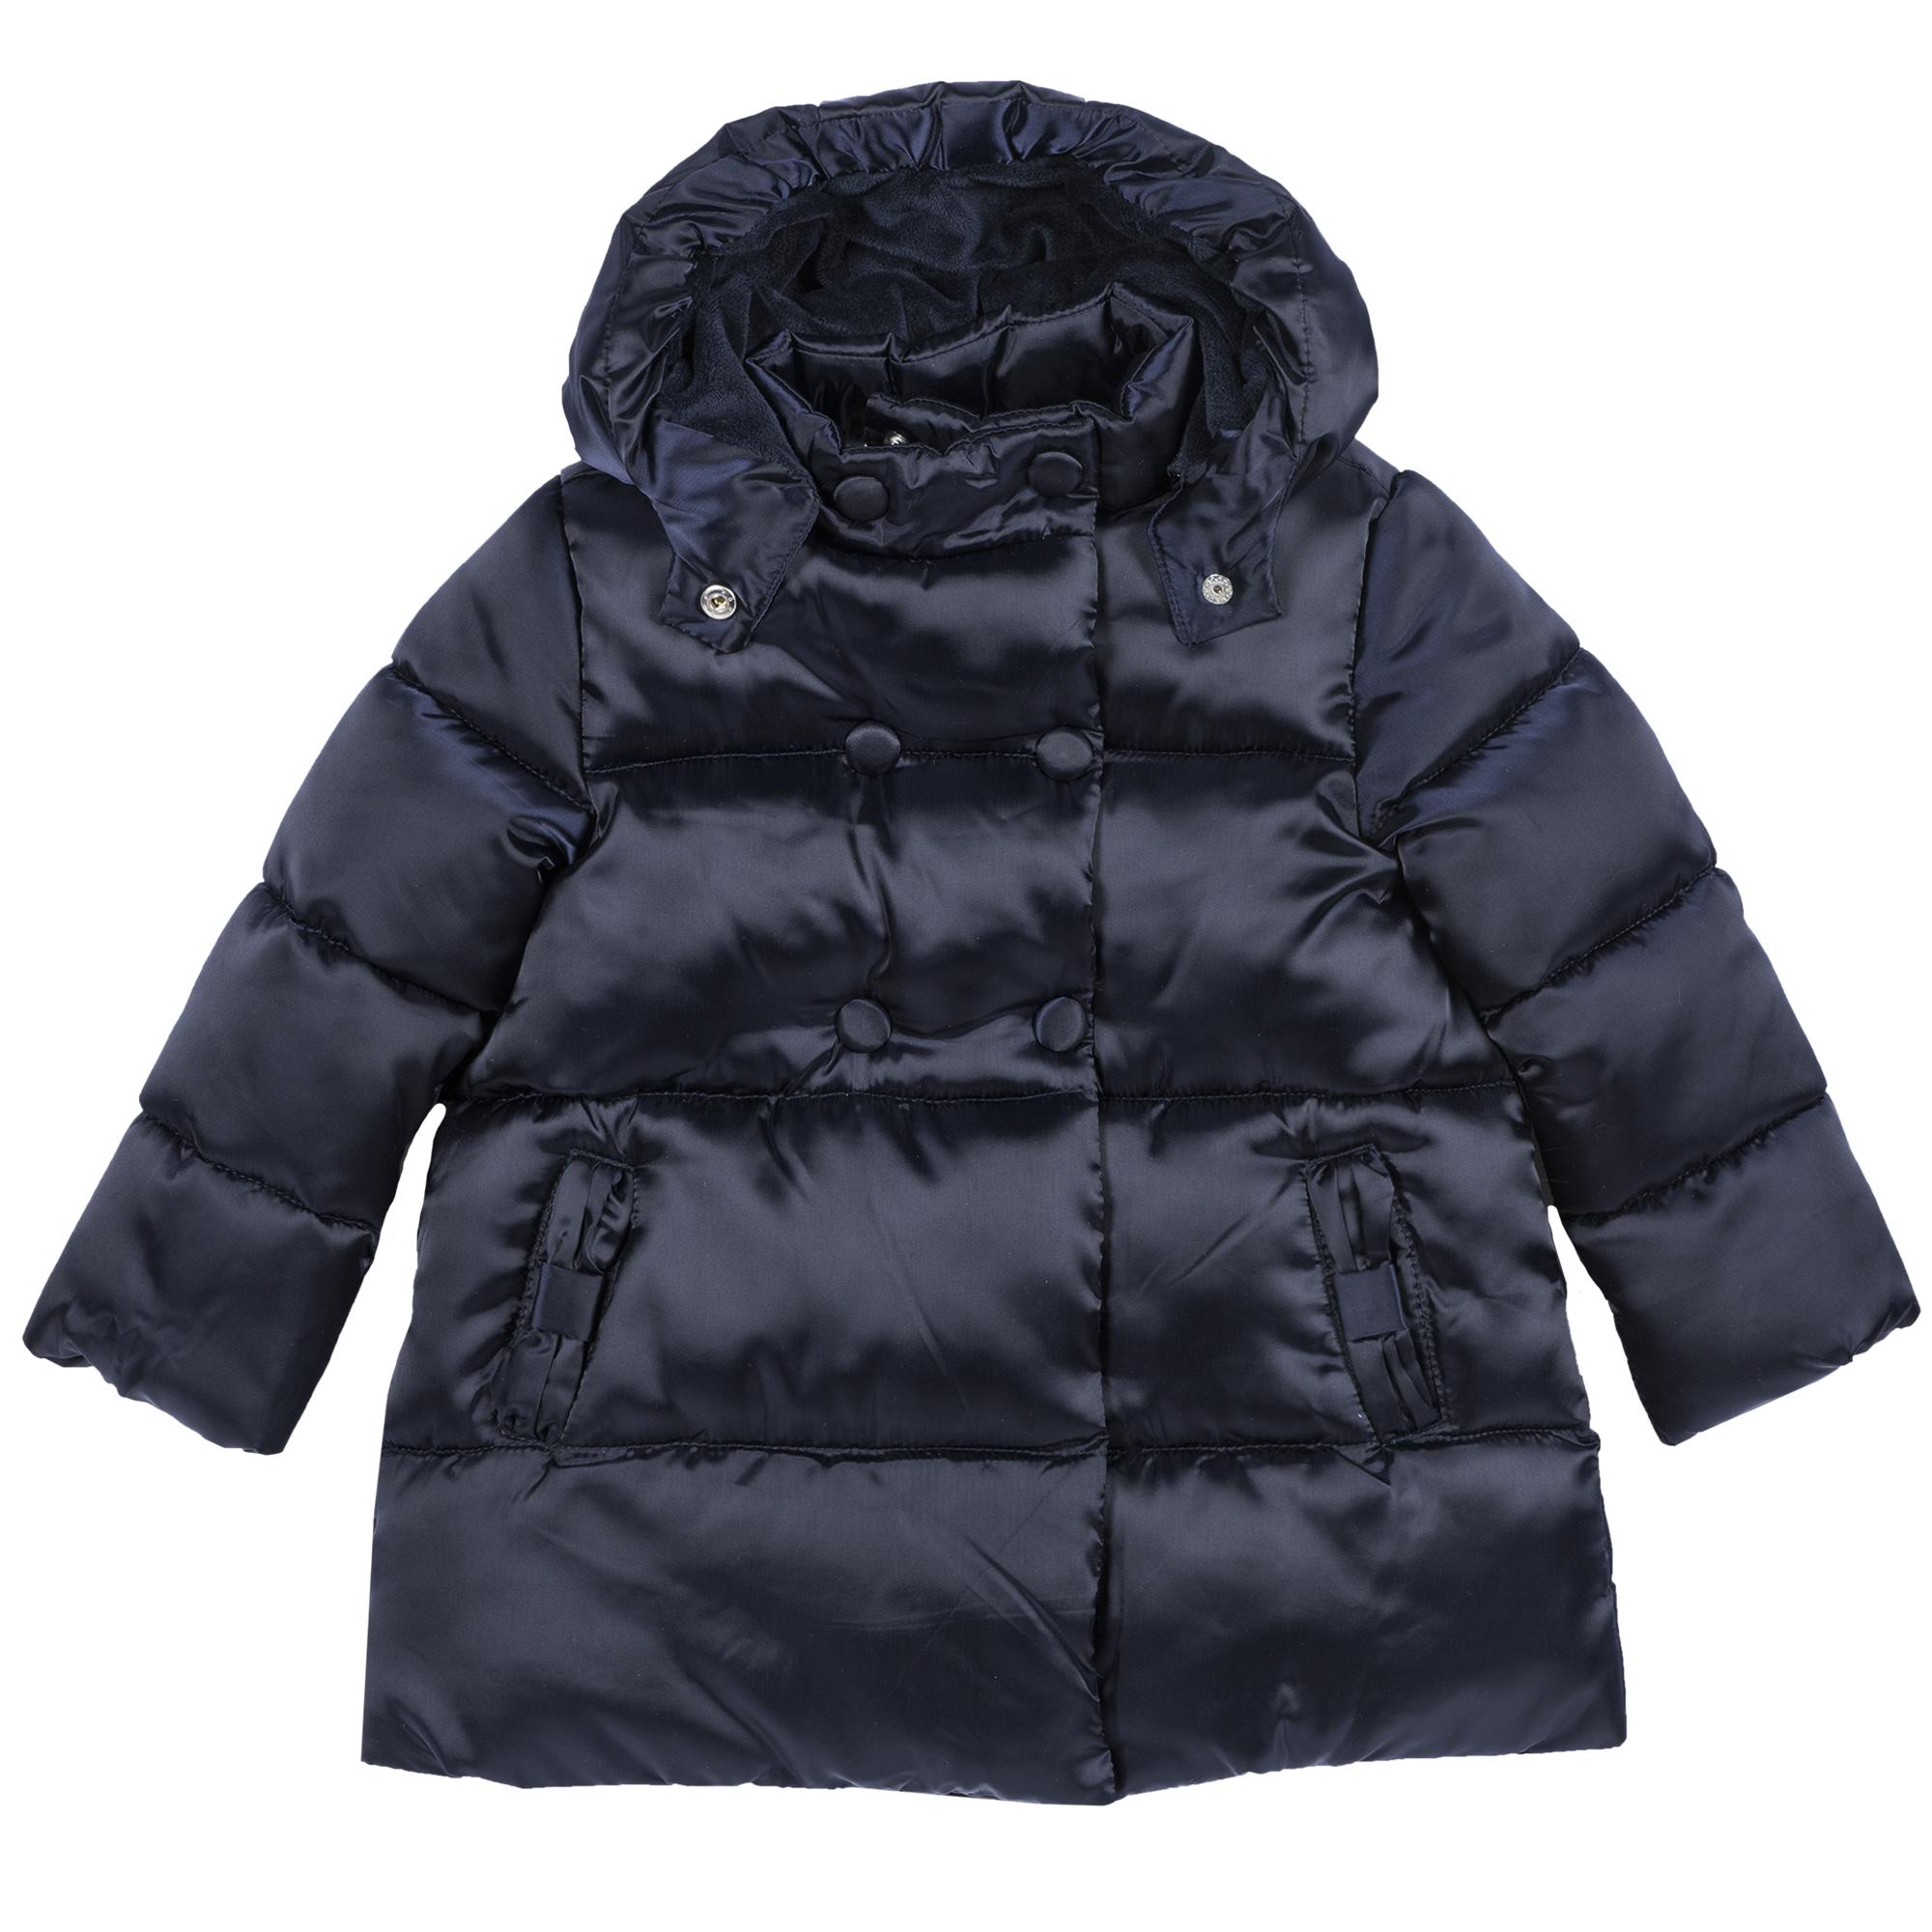 Jacheta copii Chicco, albastru inchis